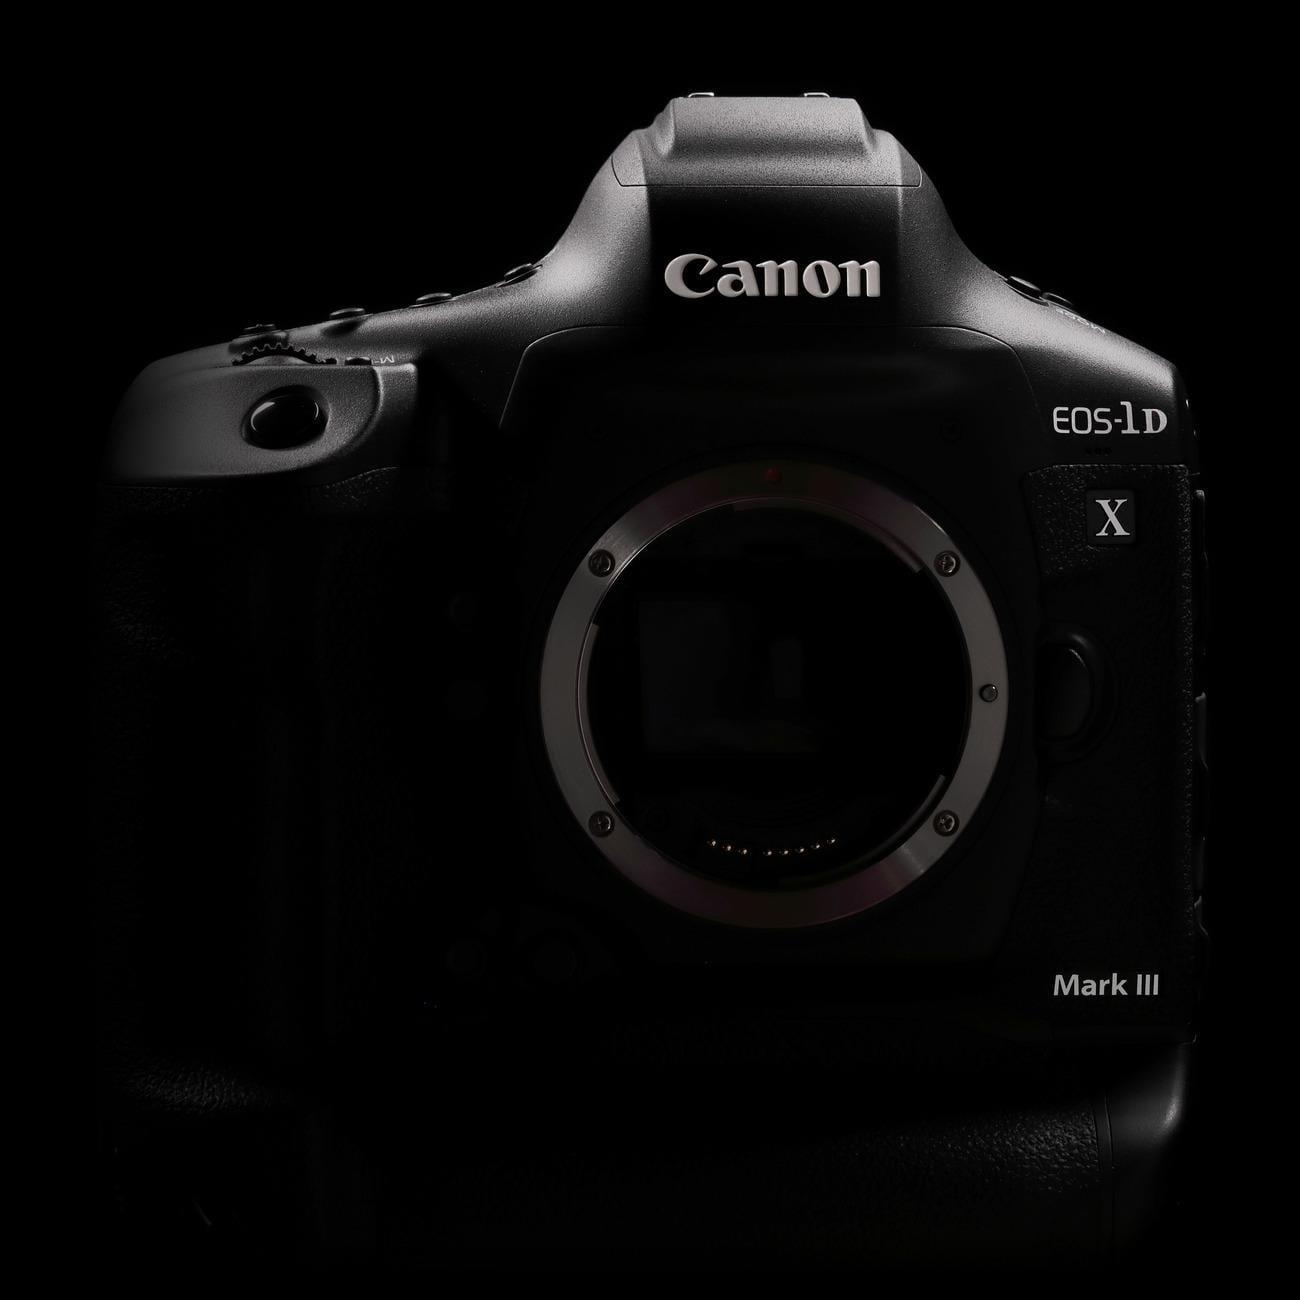 Canon анонсировал разработку EOS-1D X Mark III (eos 1d x mark iii black frt)